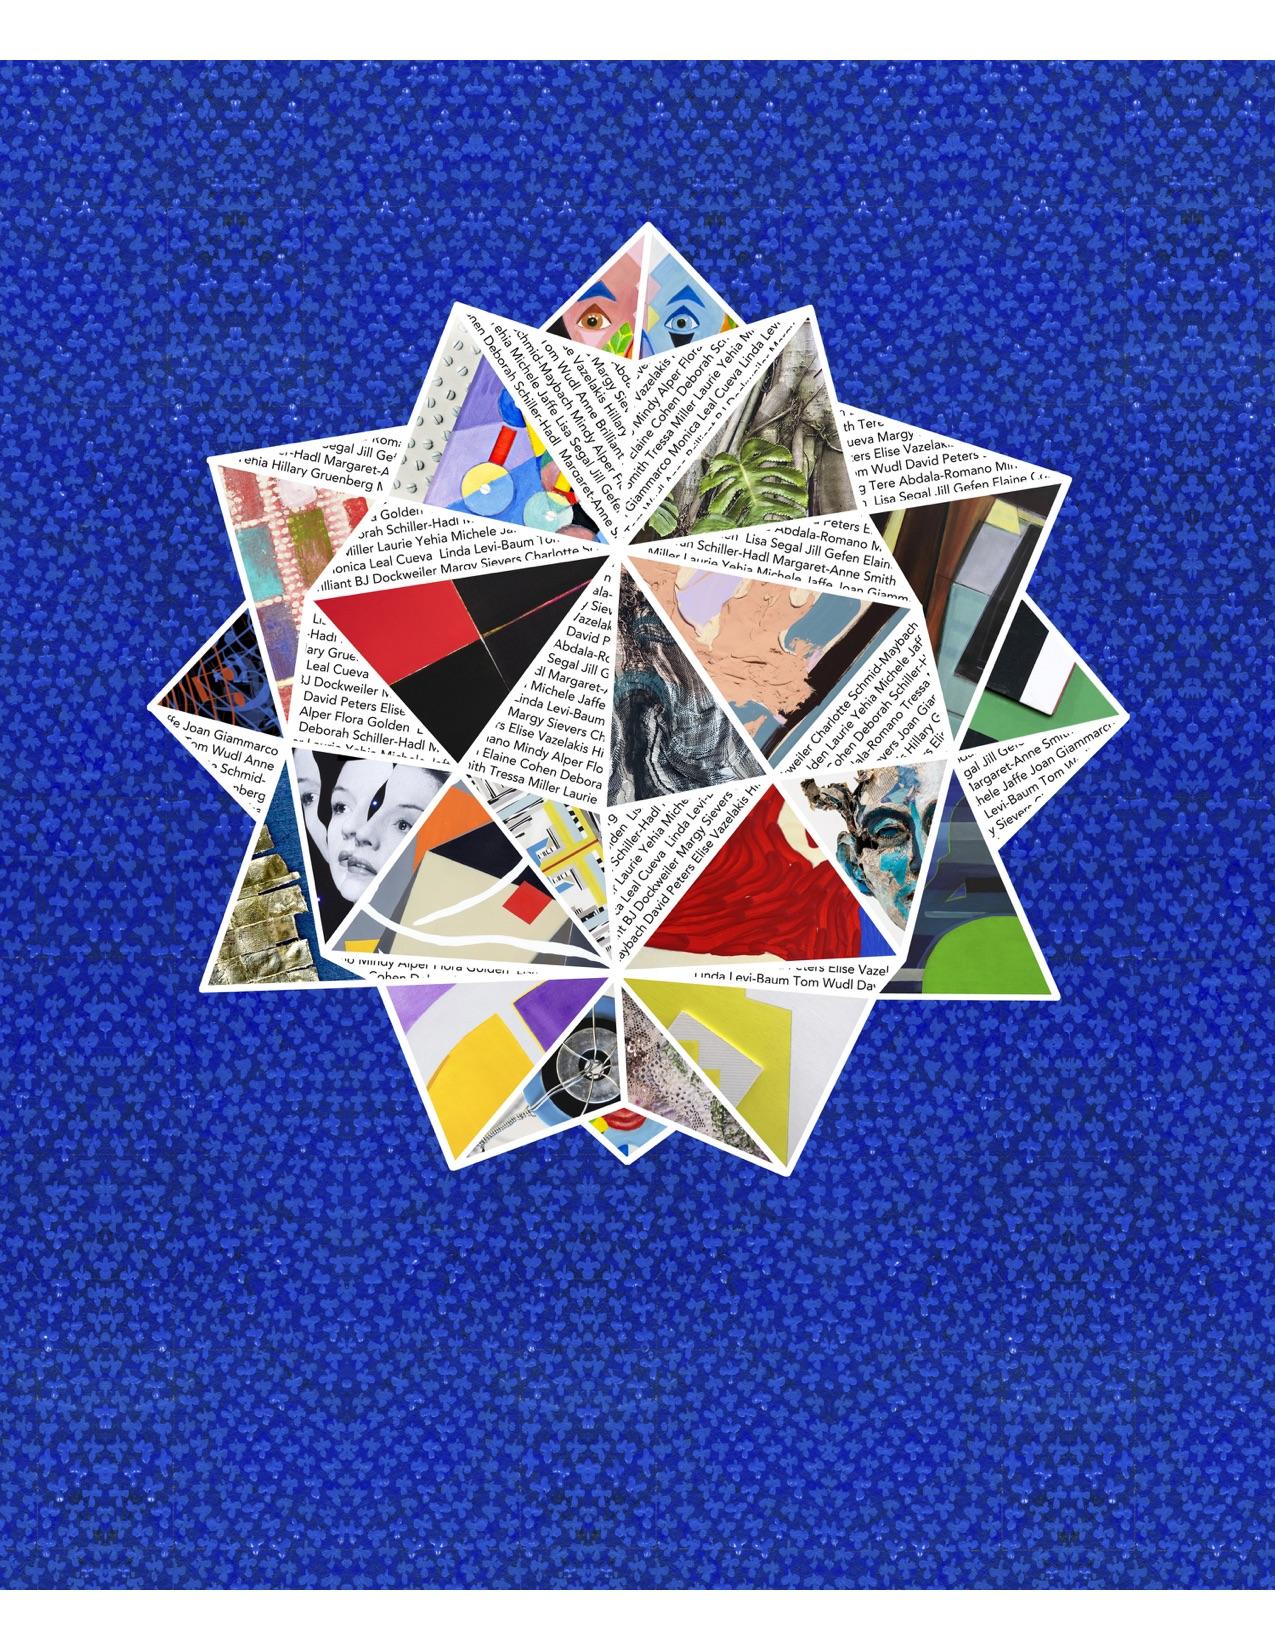 Polyhedron_StudioEleven.jpg